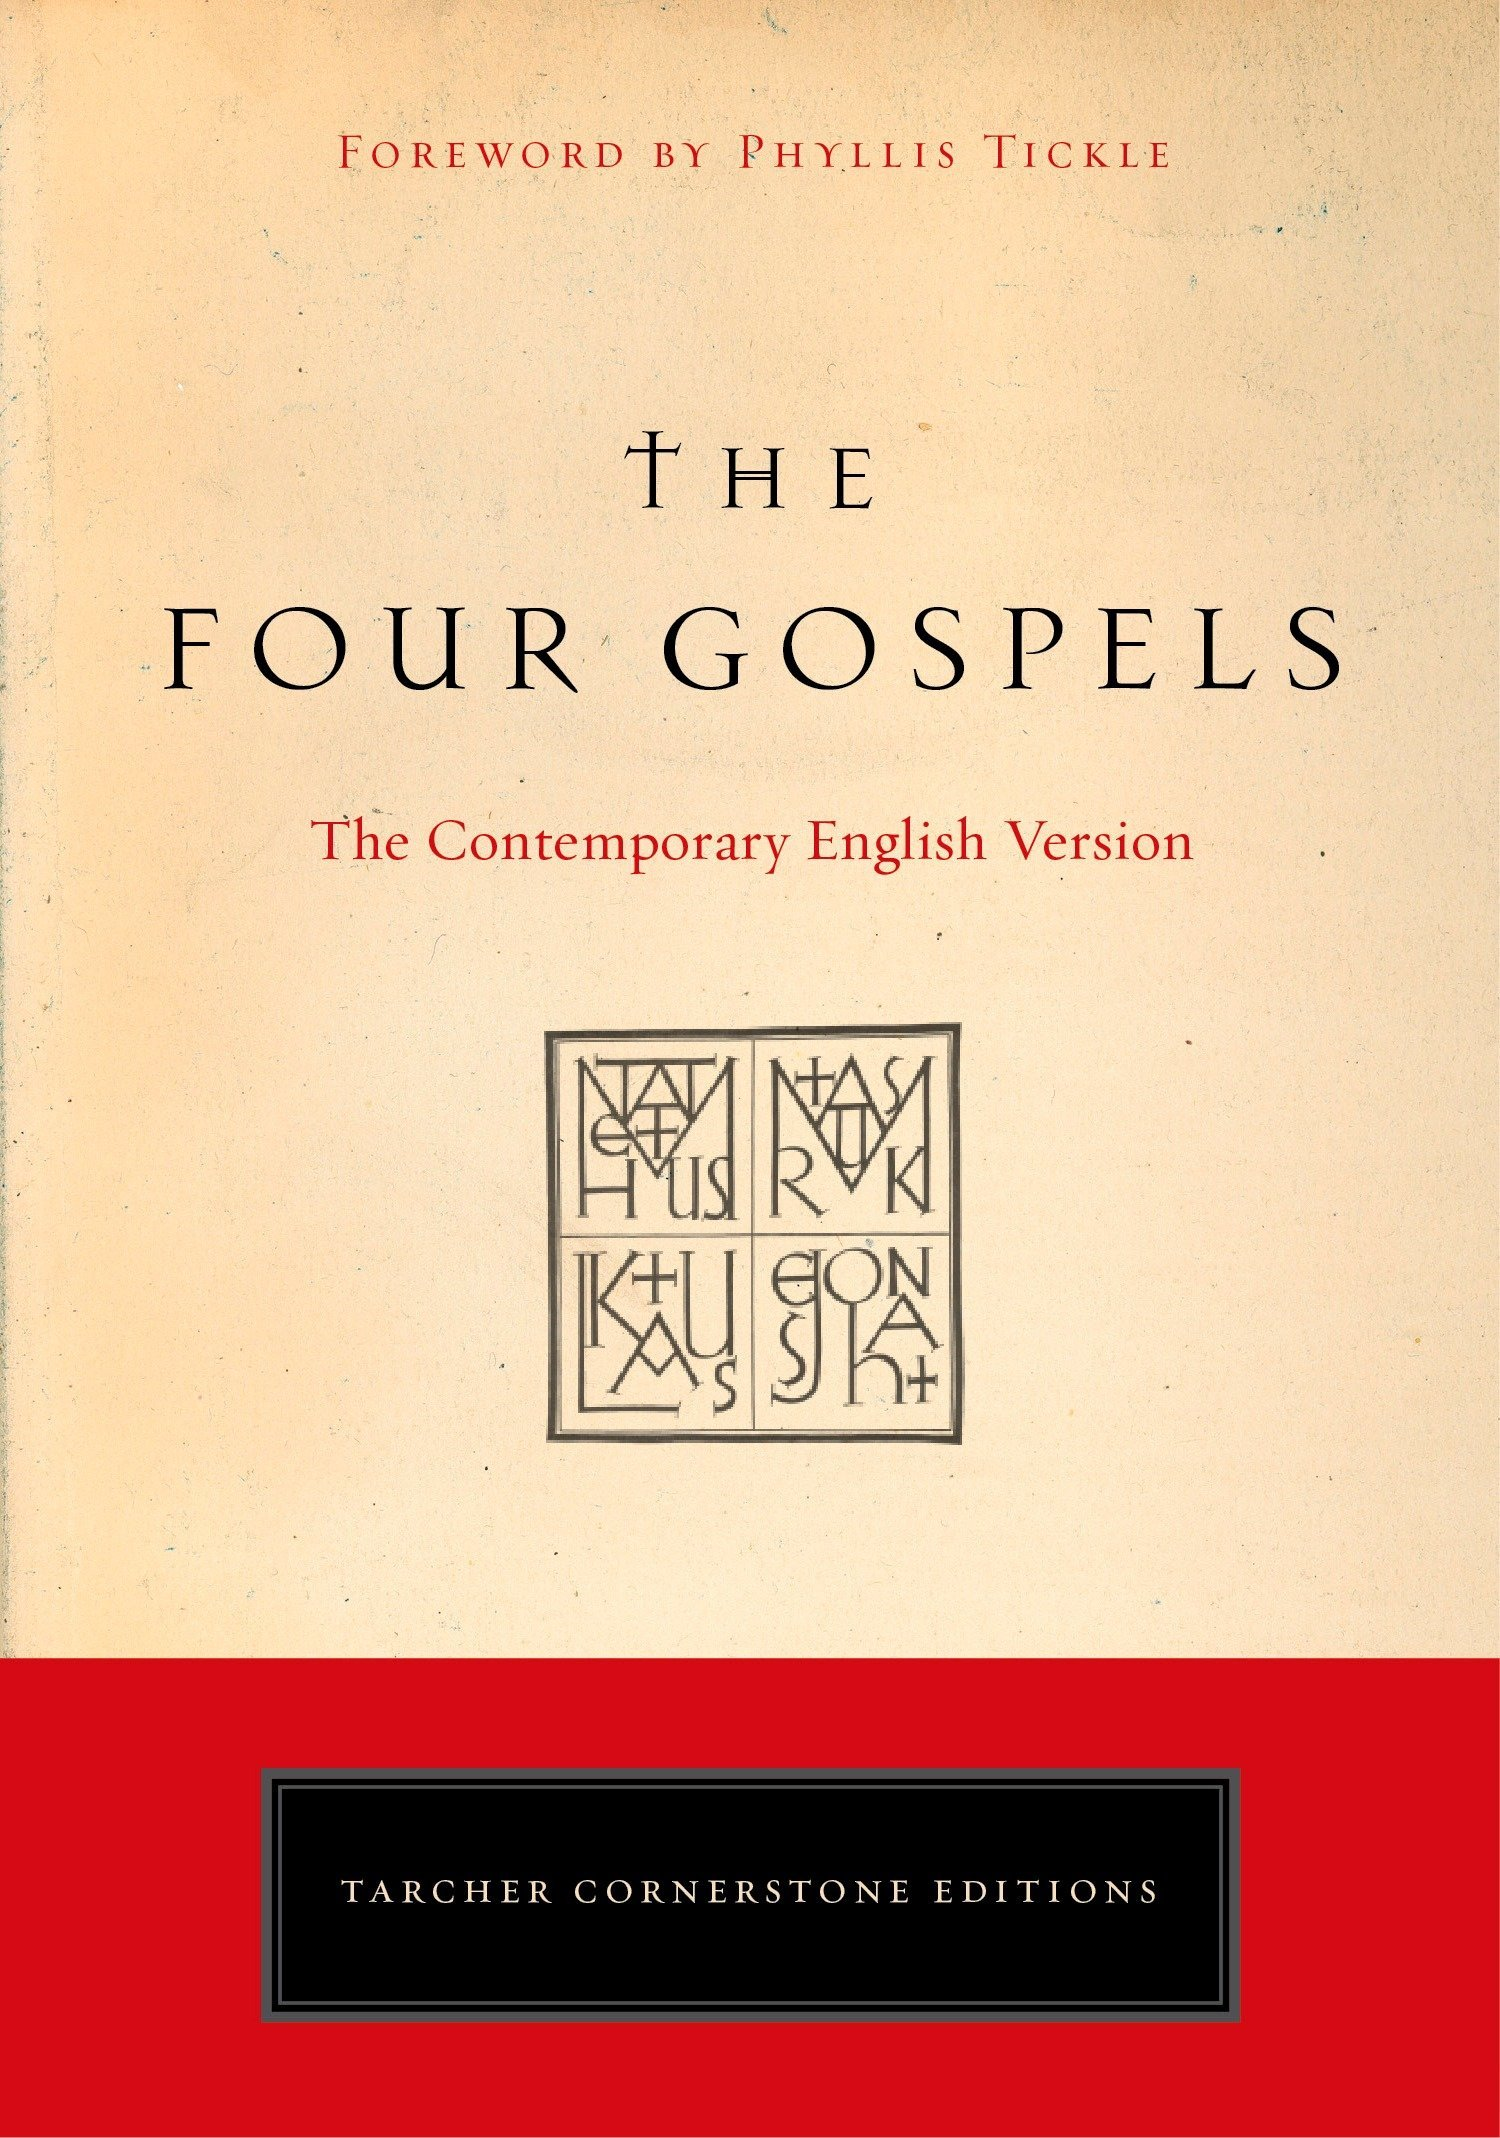 The Four Gospels: The Contemporary English Version (Tarcher Cornerstone Editions) ebook